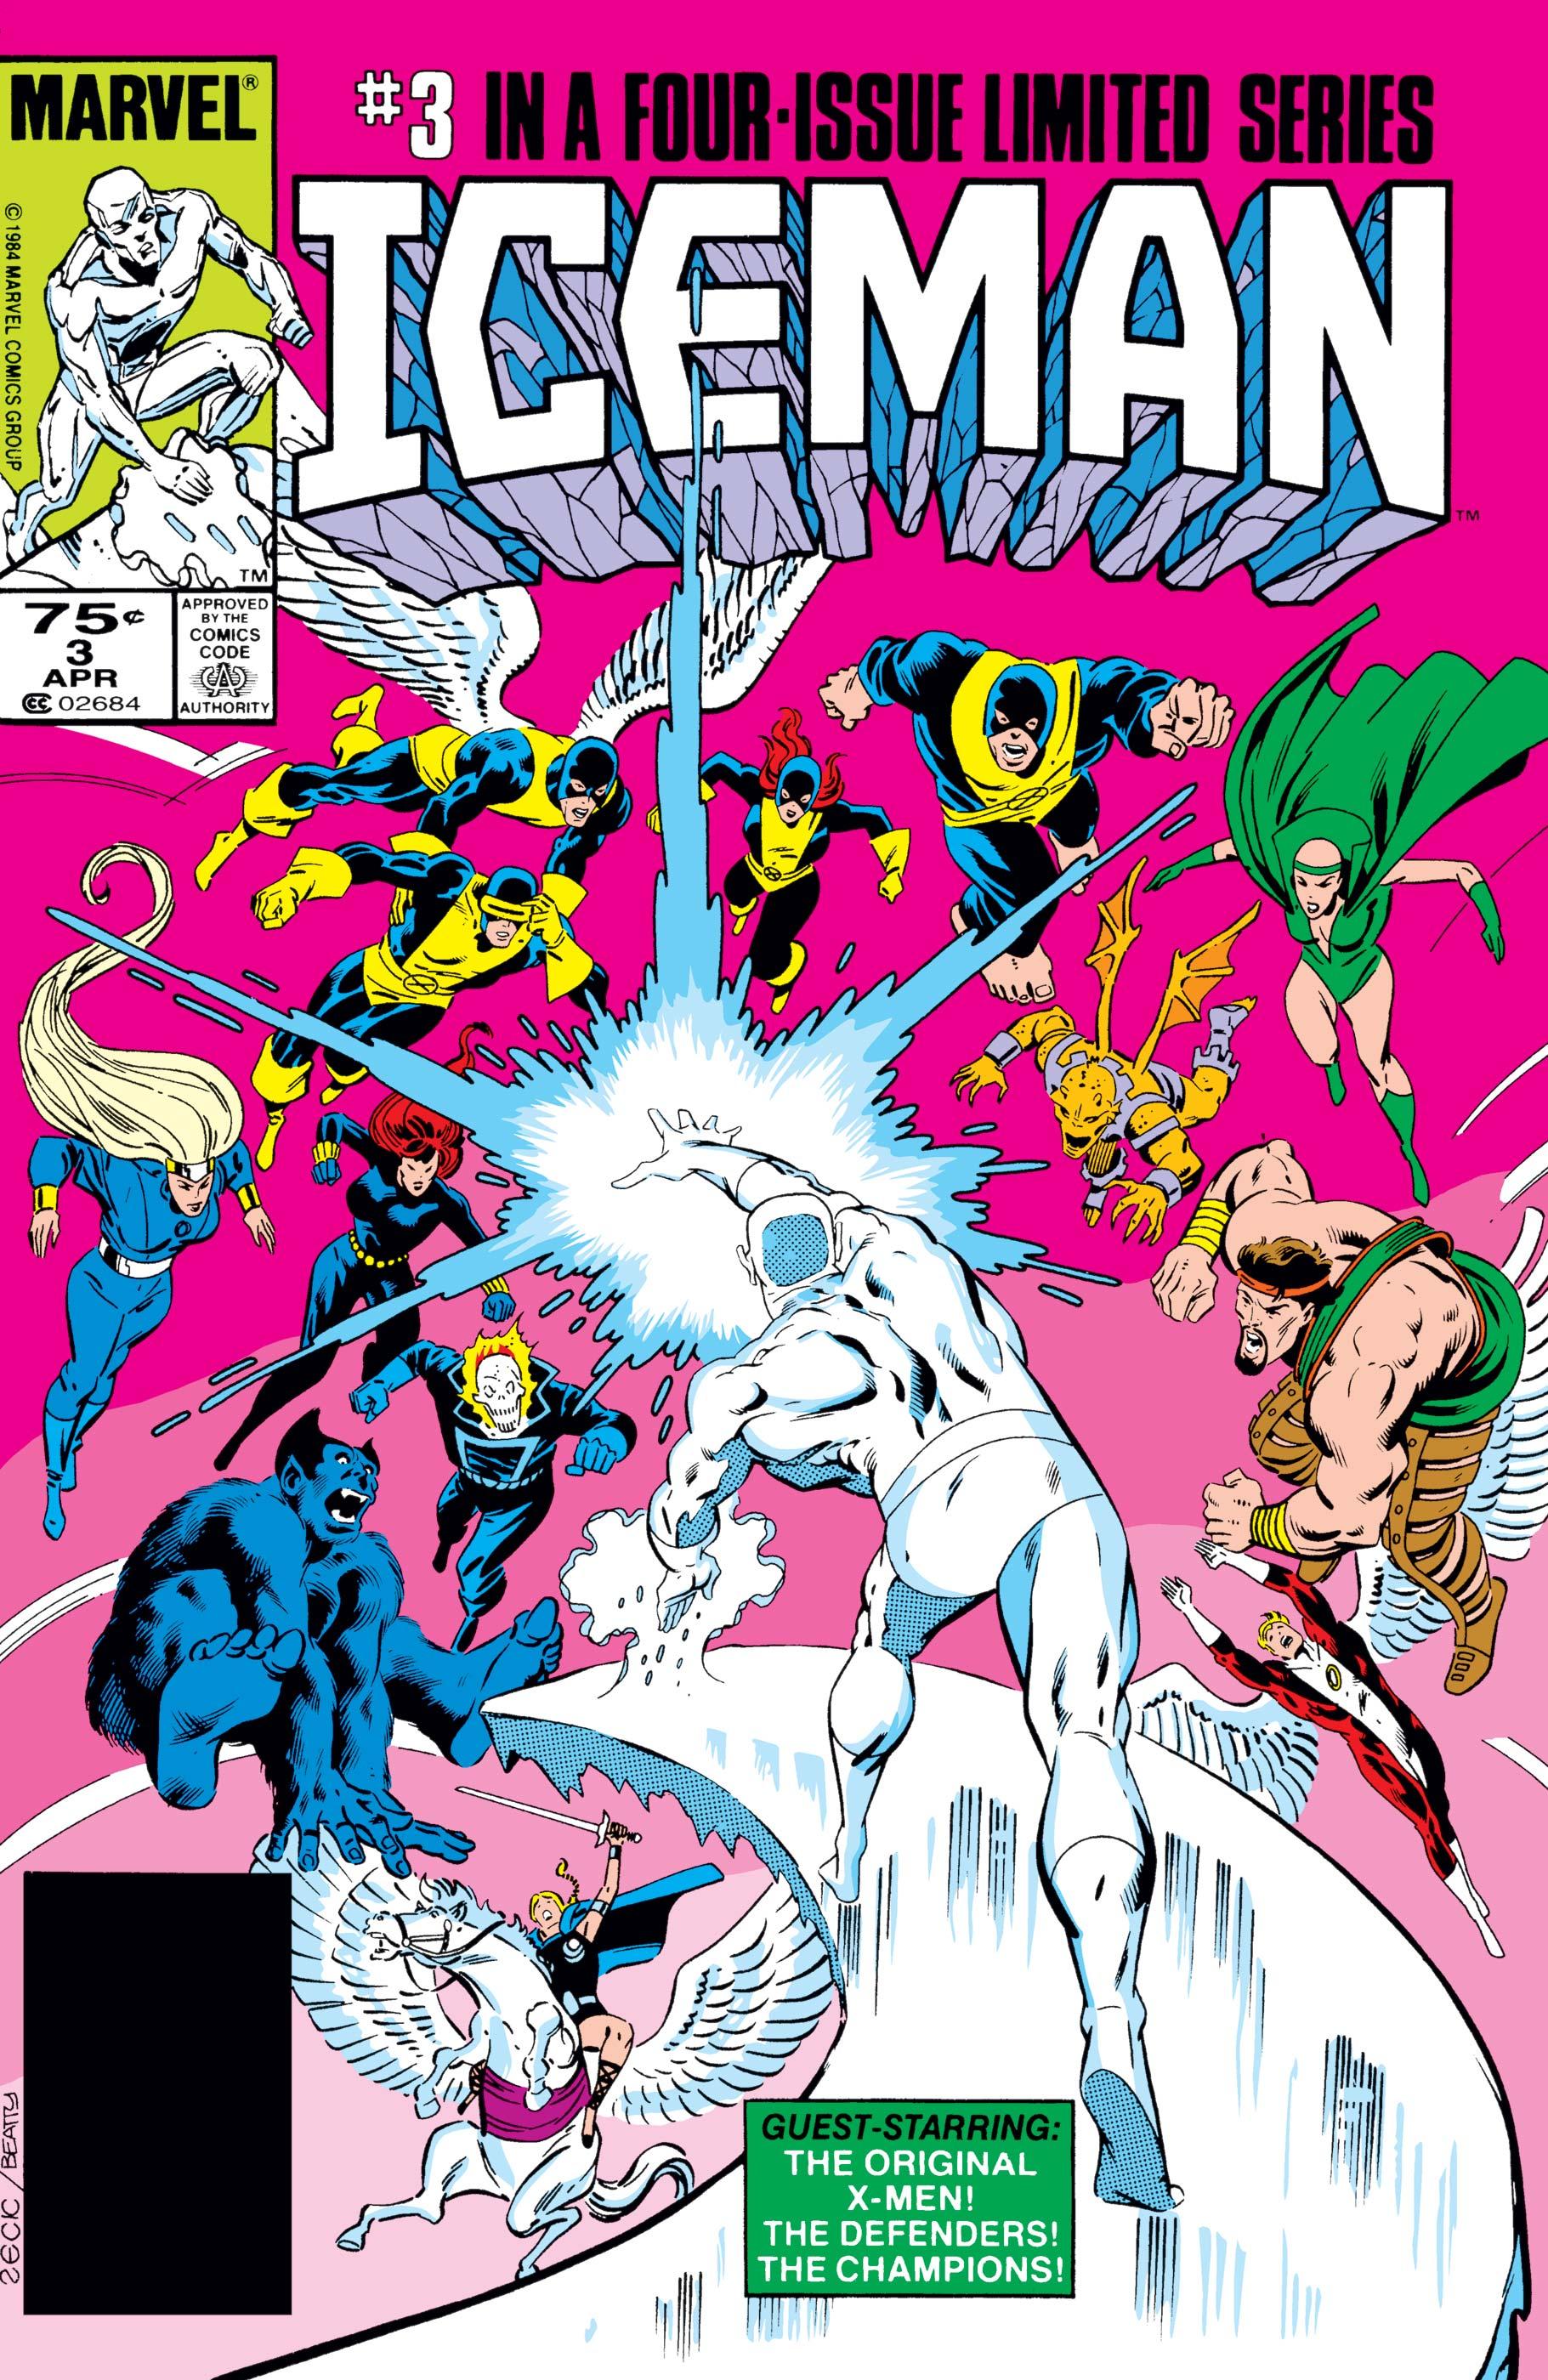 Iceman (1984) #3